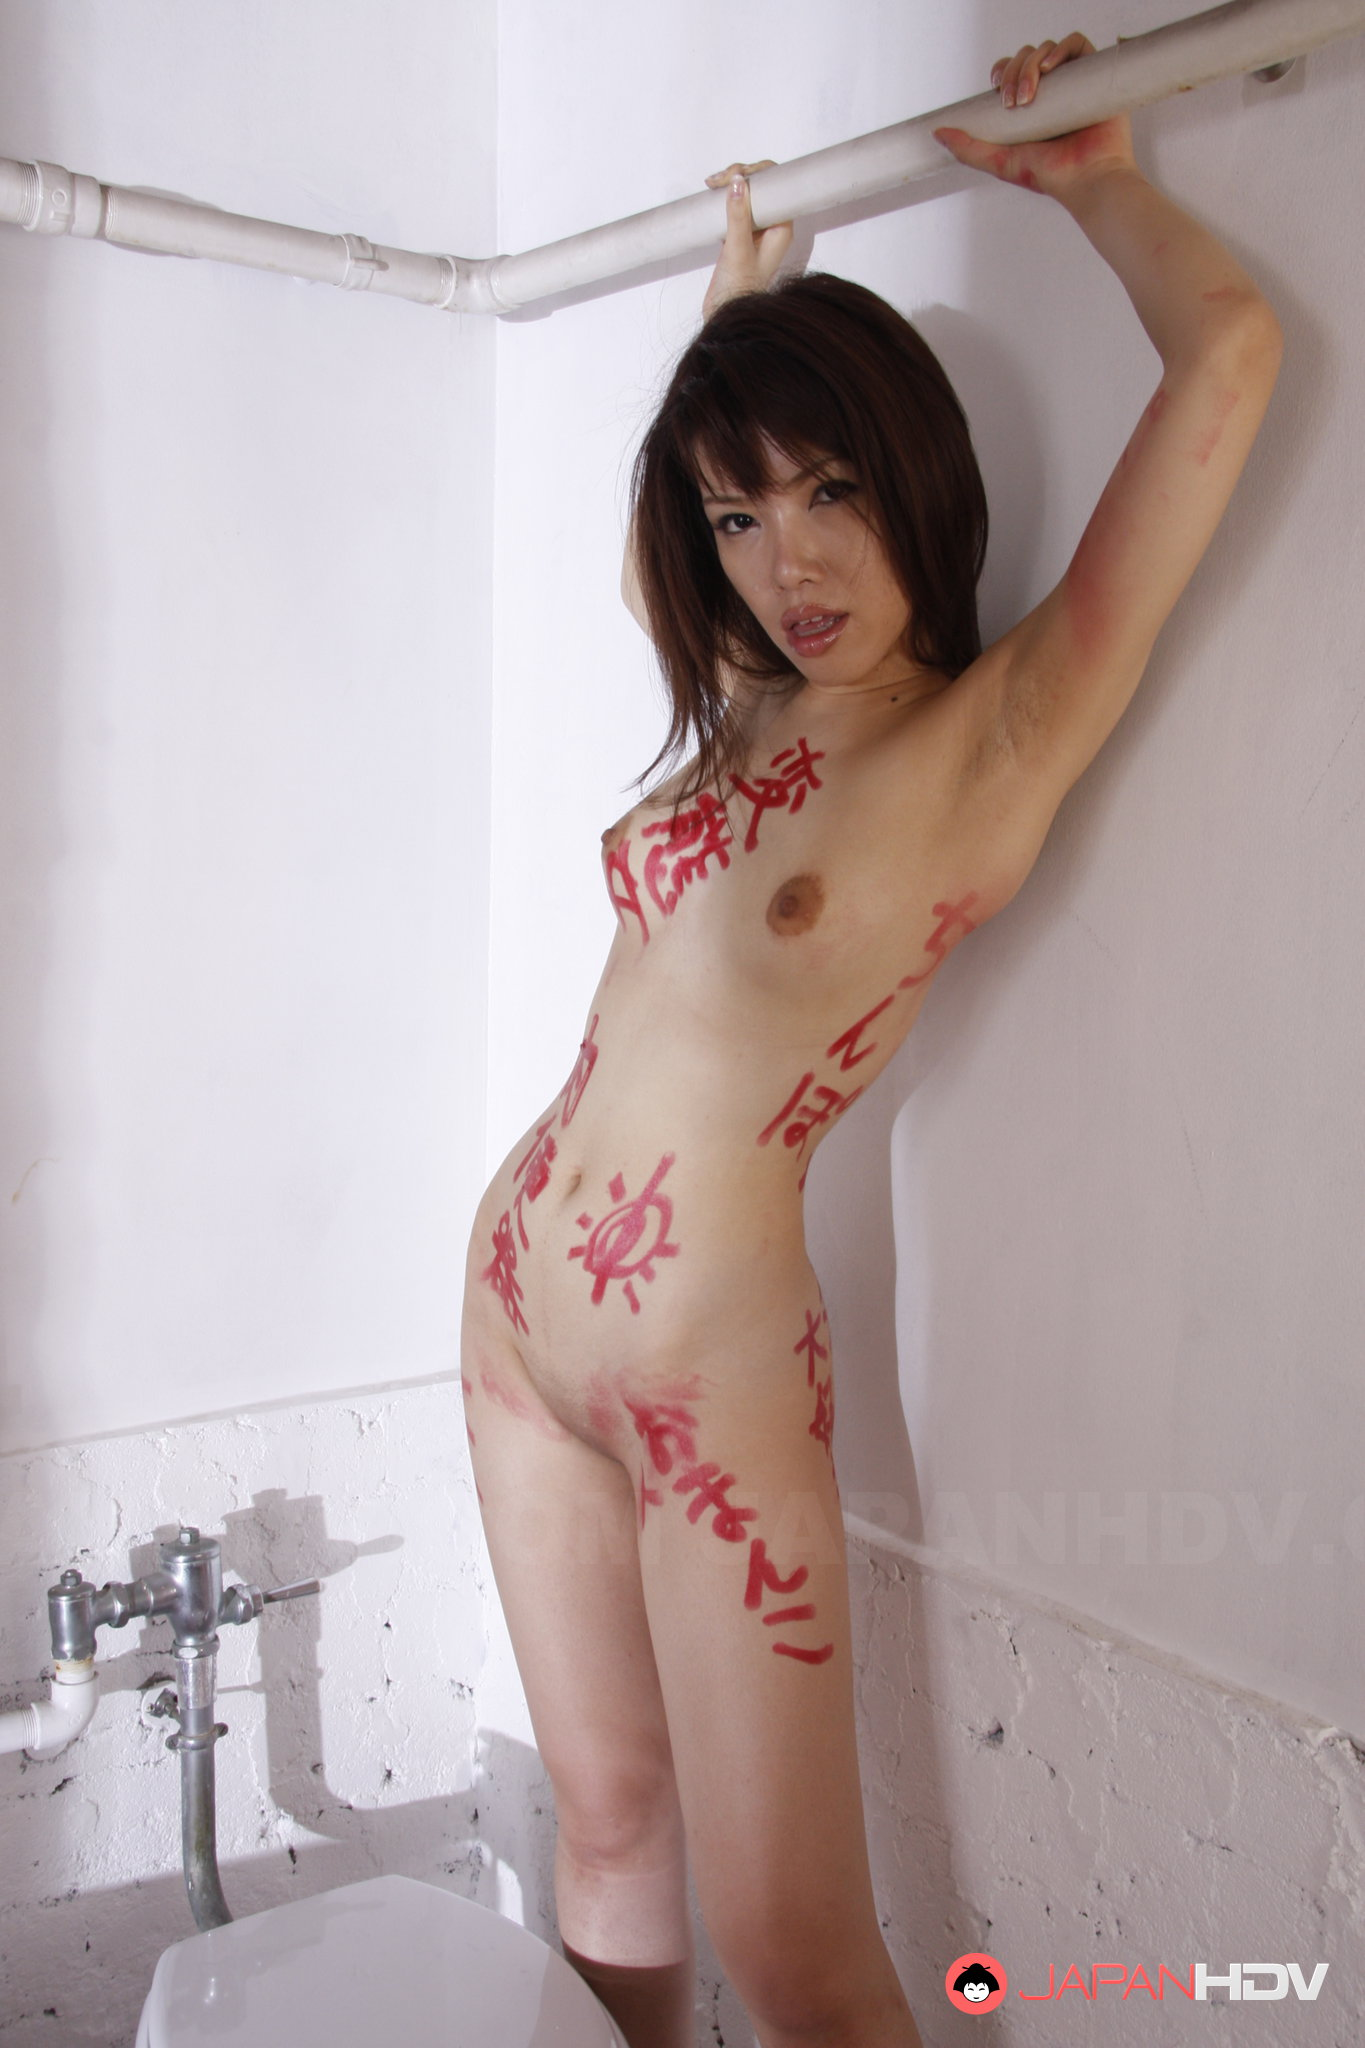 Mai Kitajima  nackt